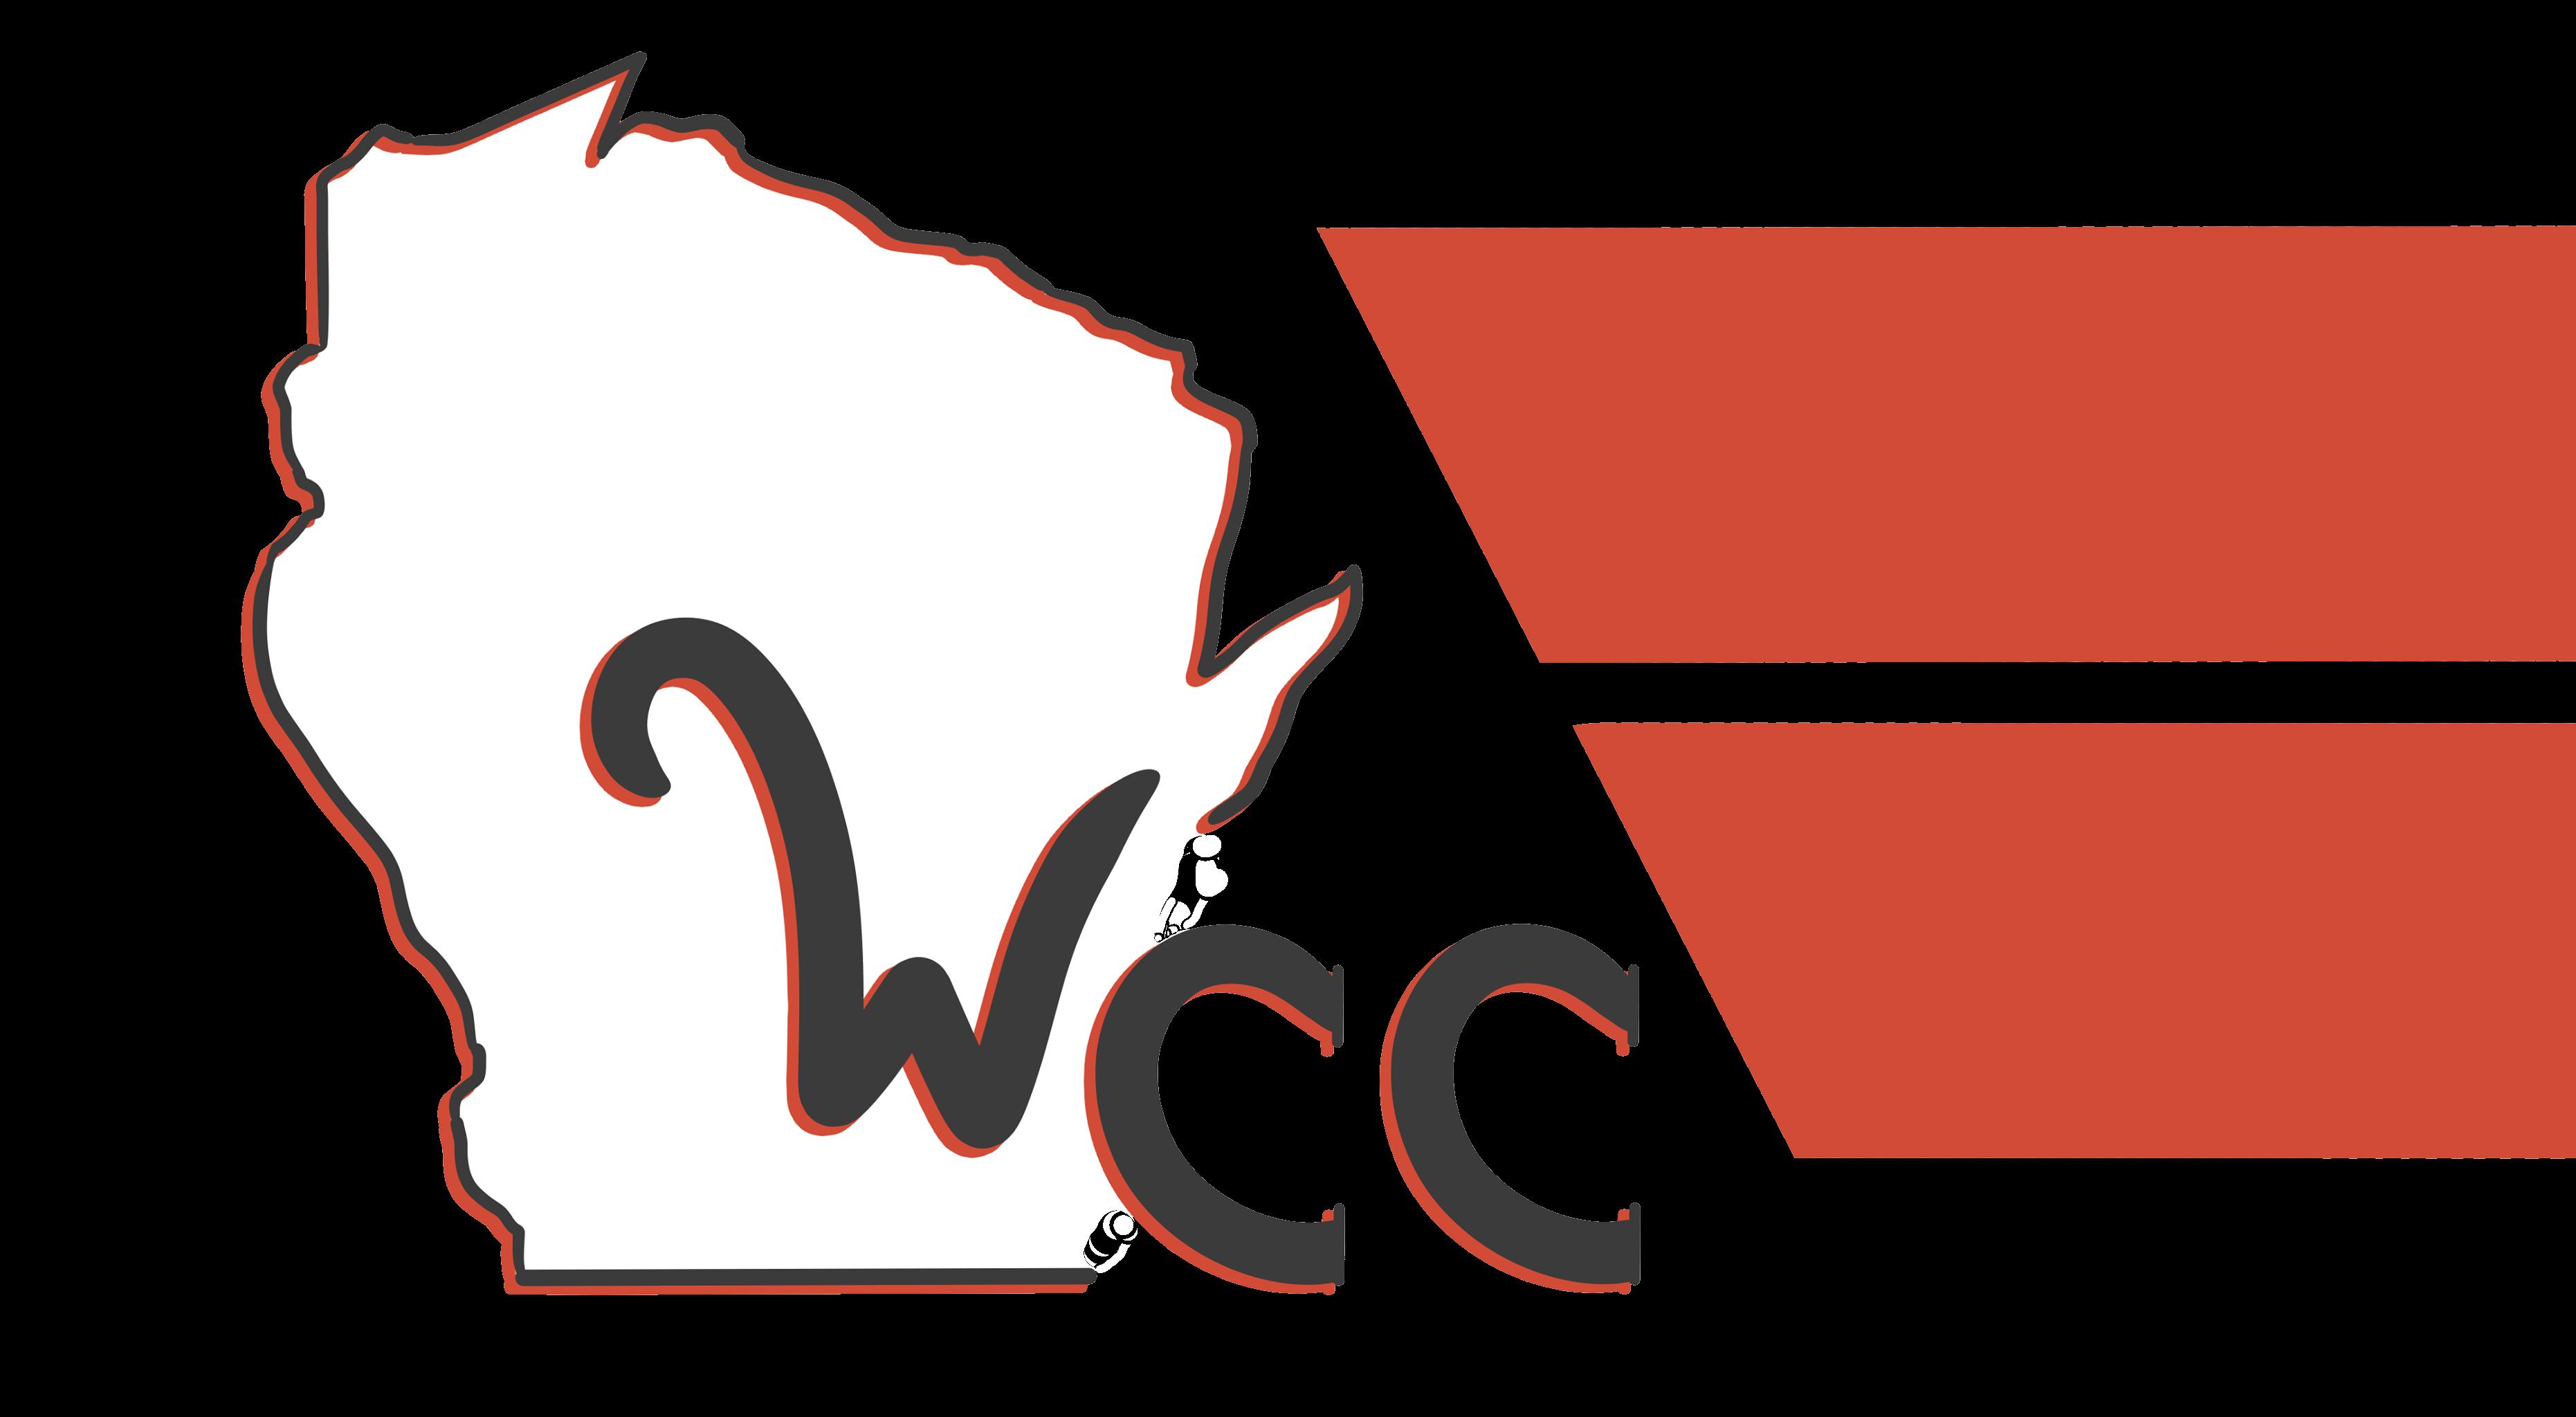 Wisconsin Computer Club